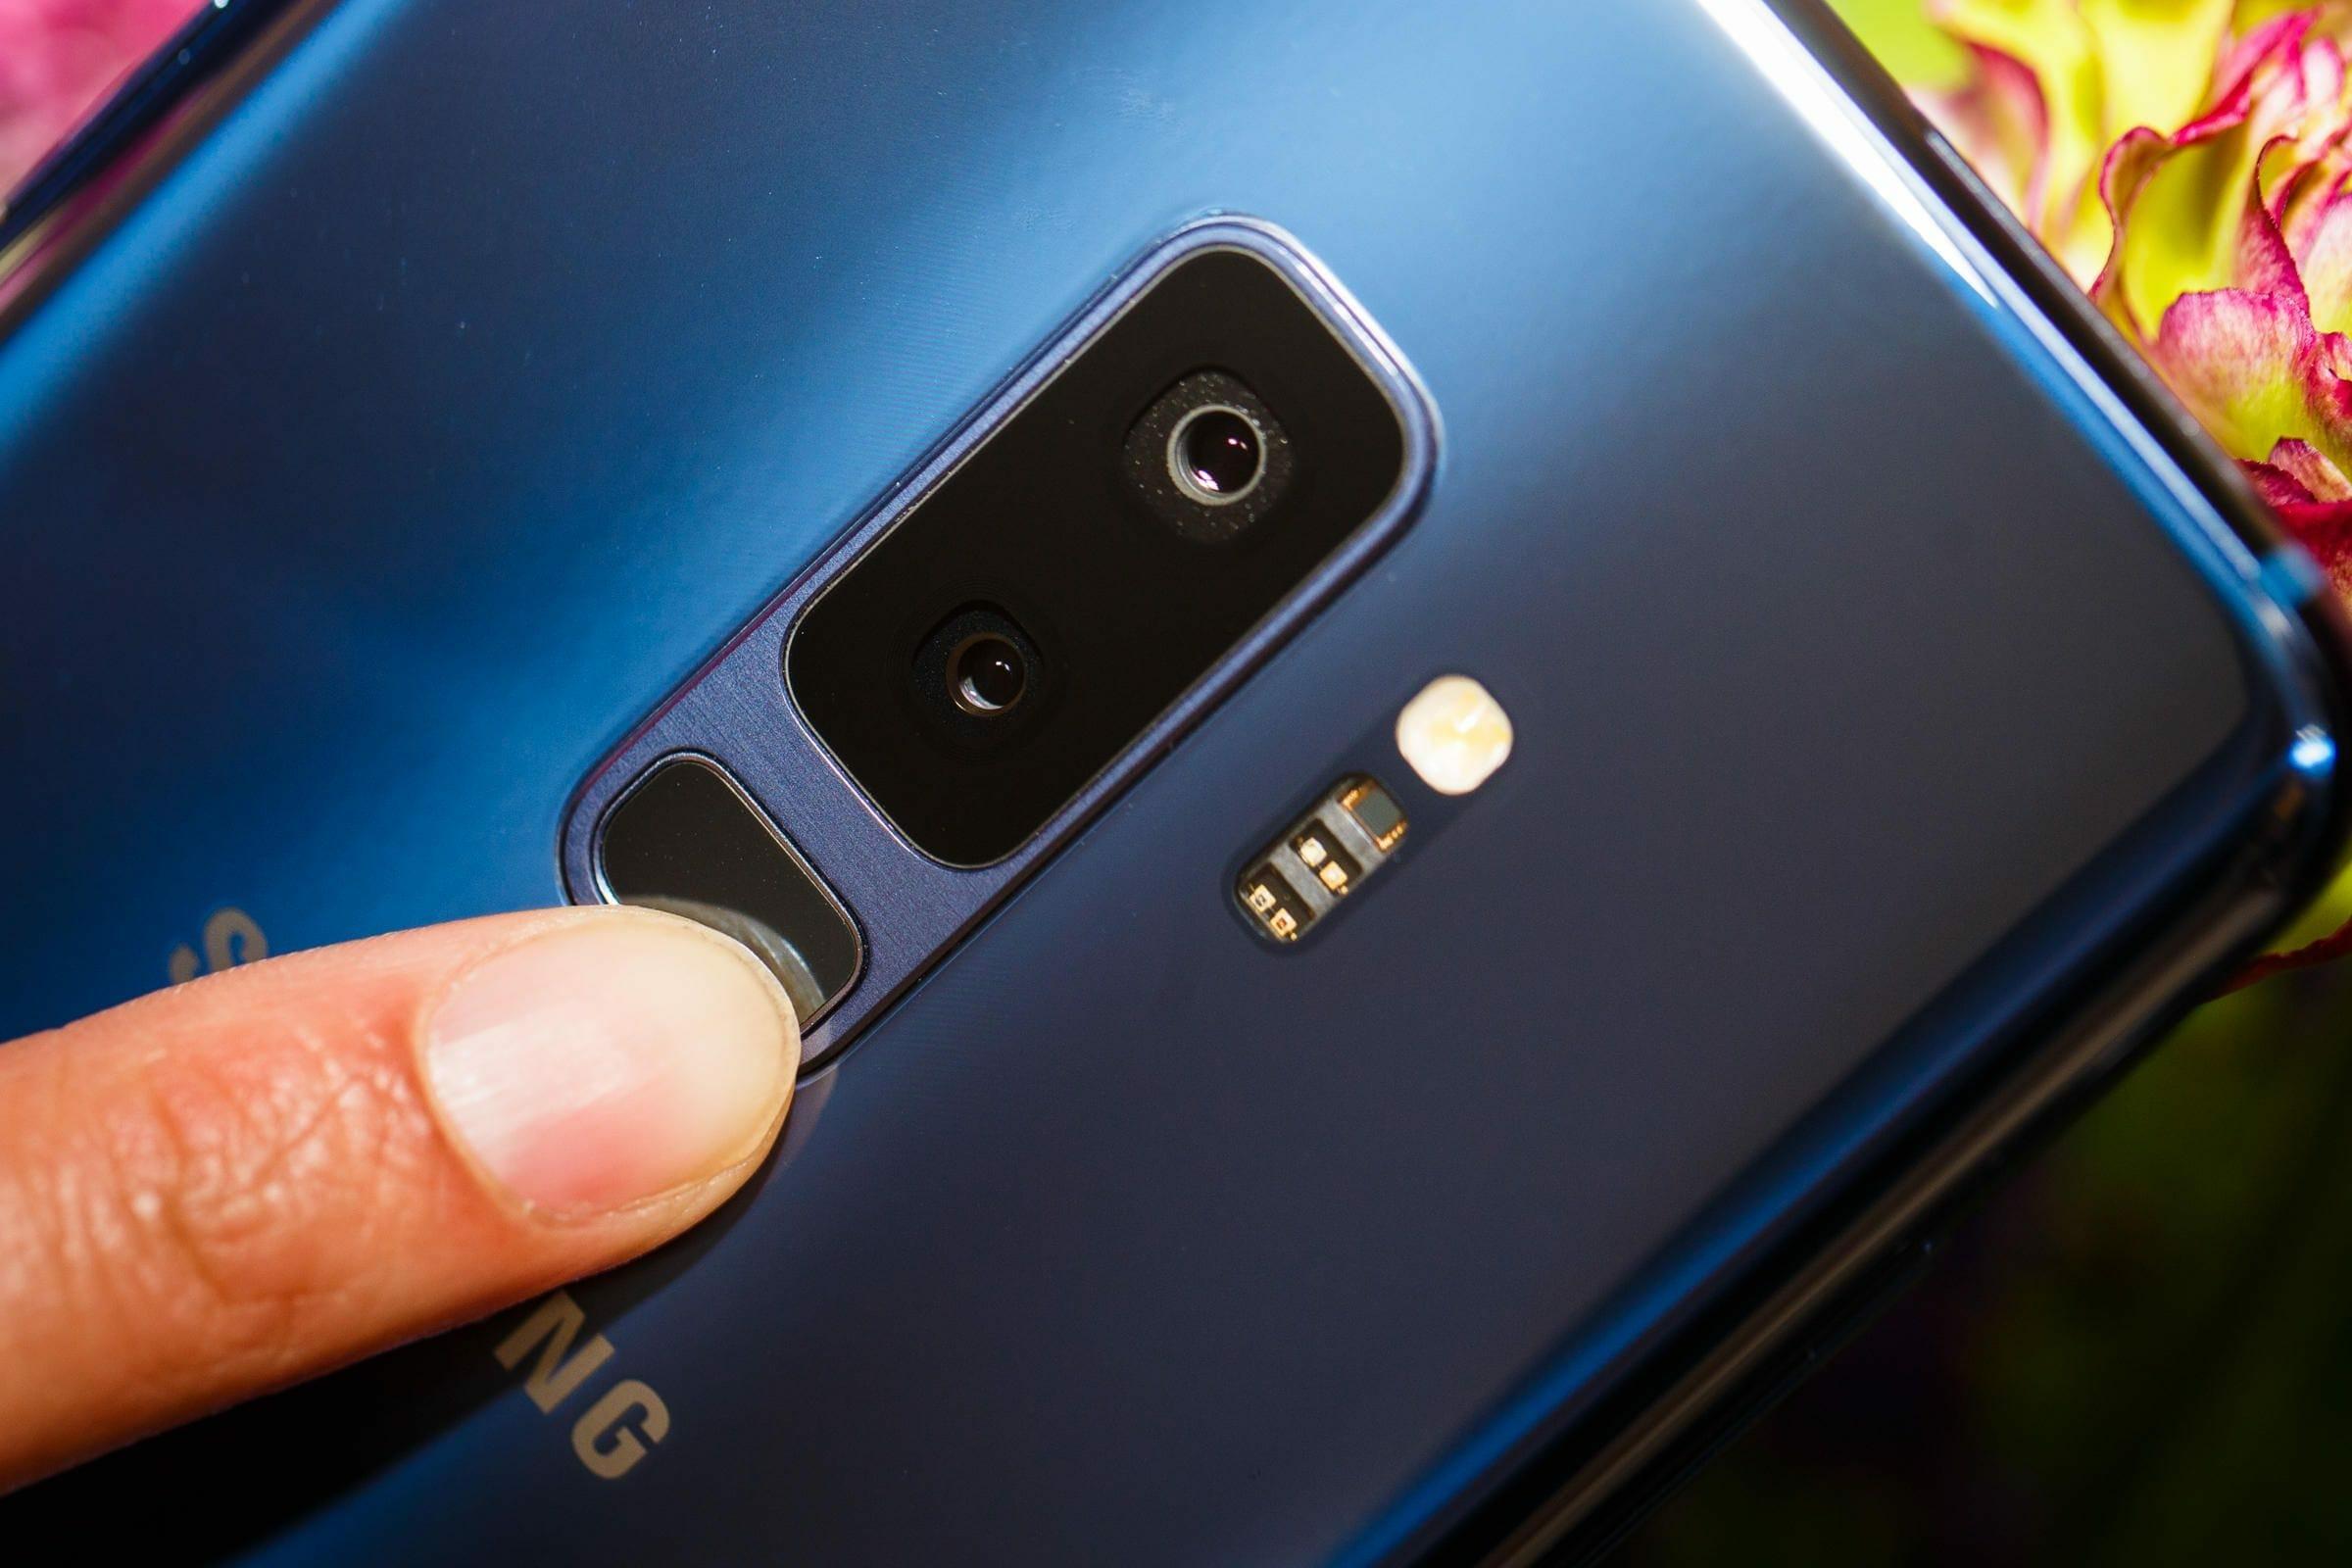 Samsung Galaxy S9 Substratum Theme